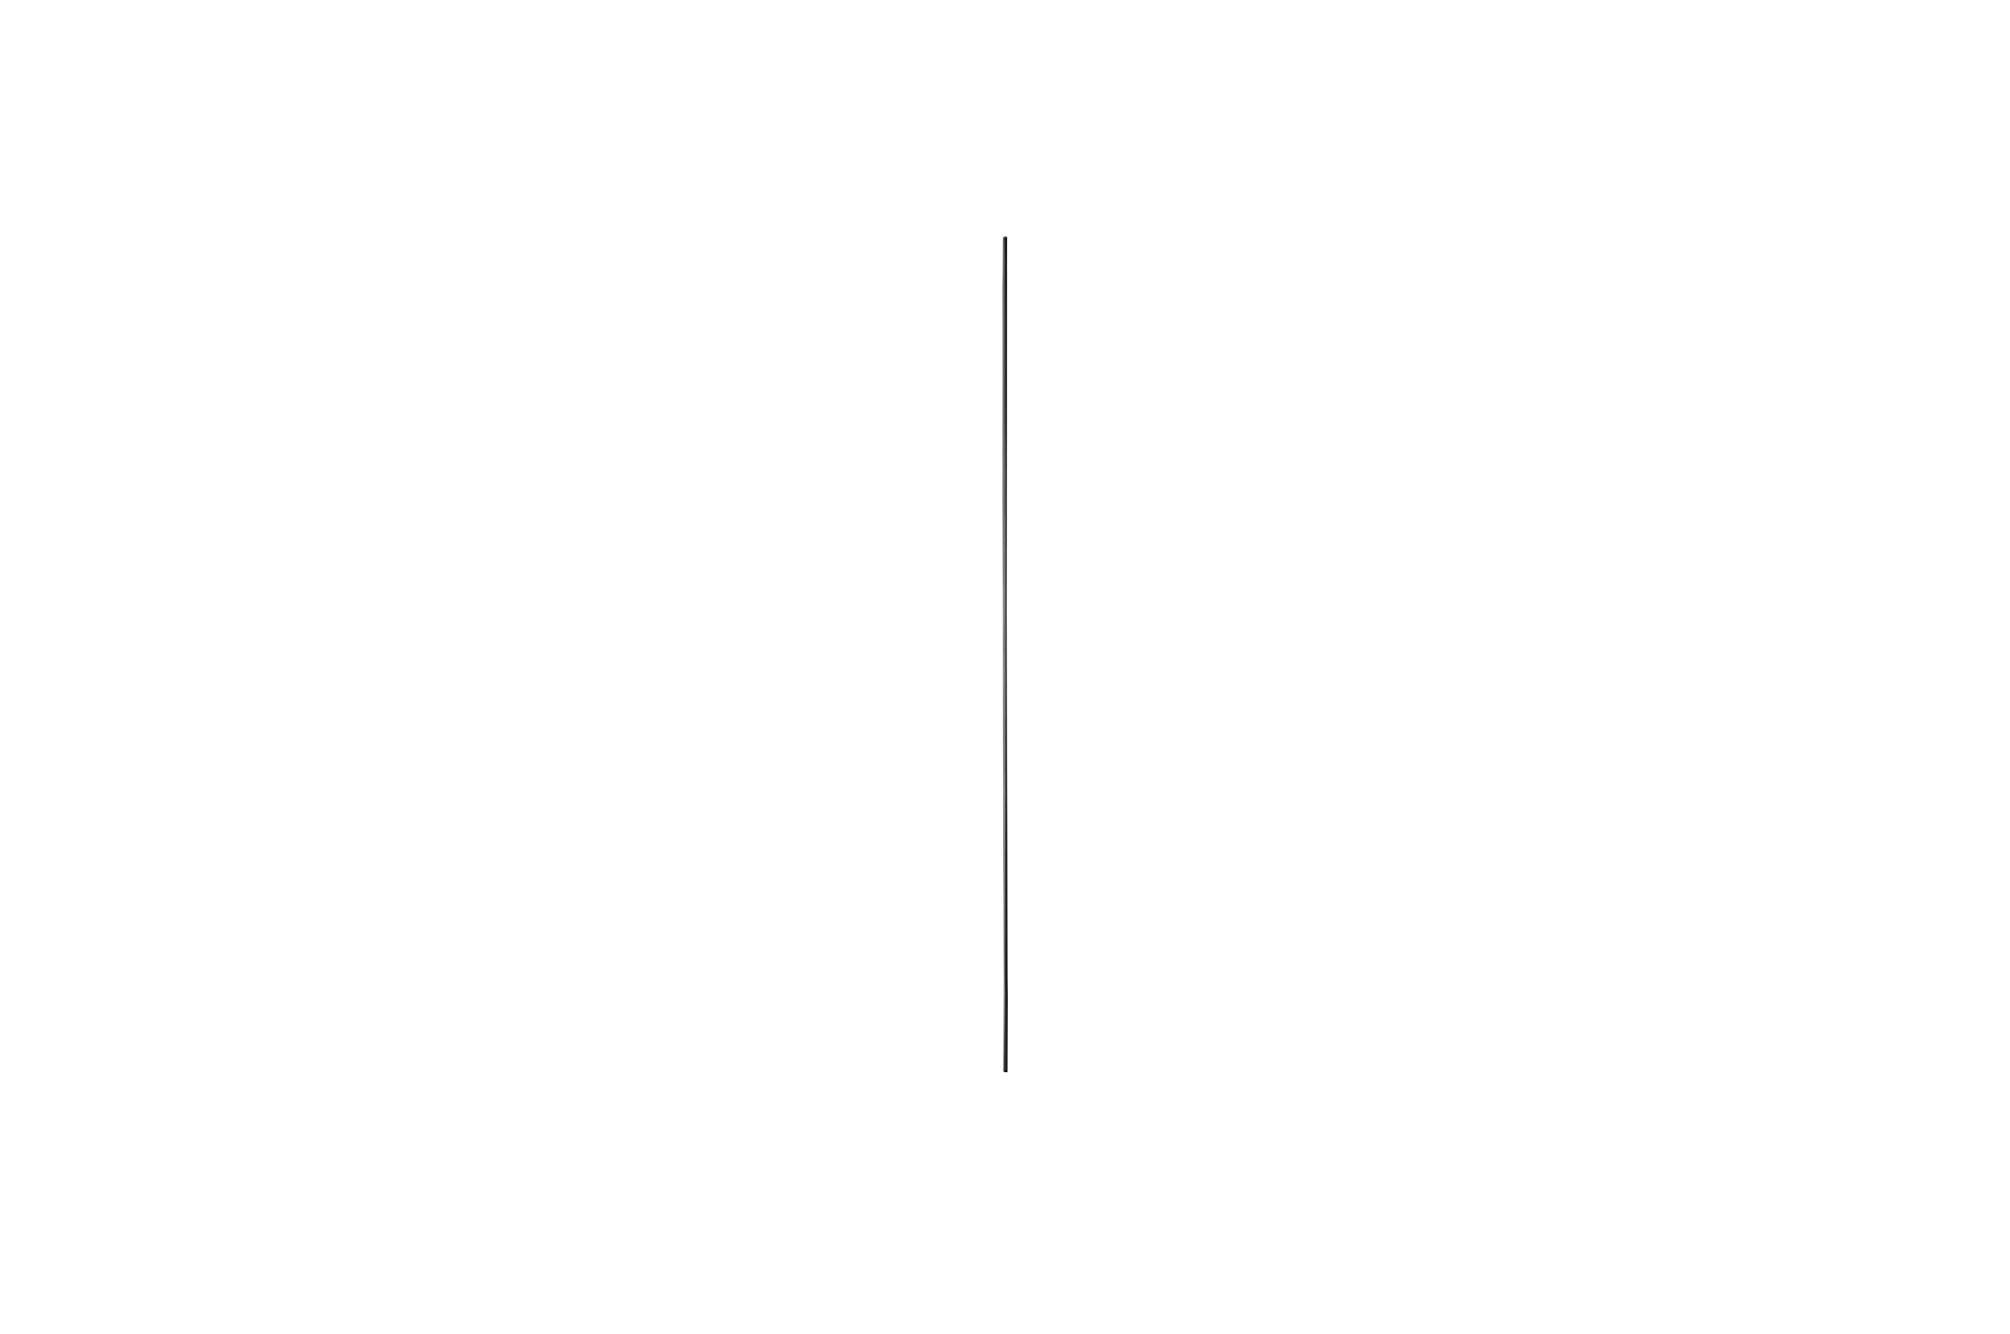 LG Pro:Centric SMART 65WT980H (EU)